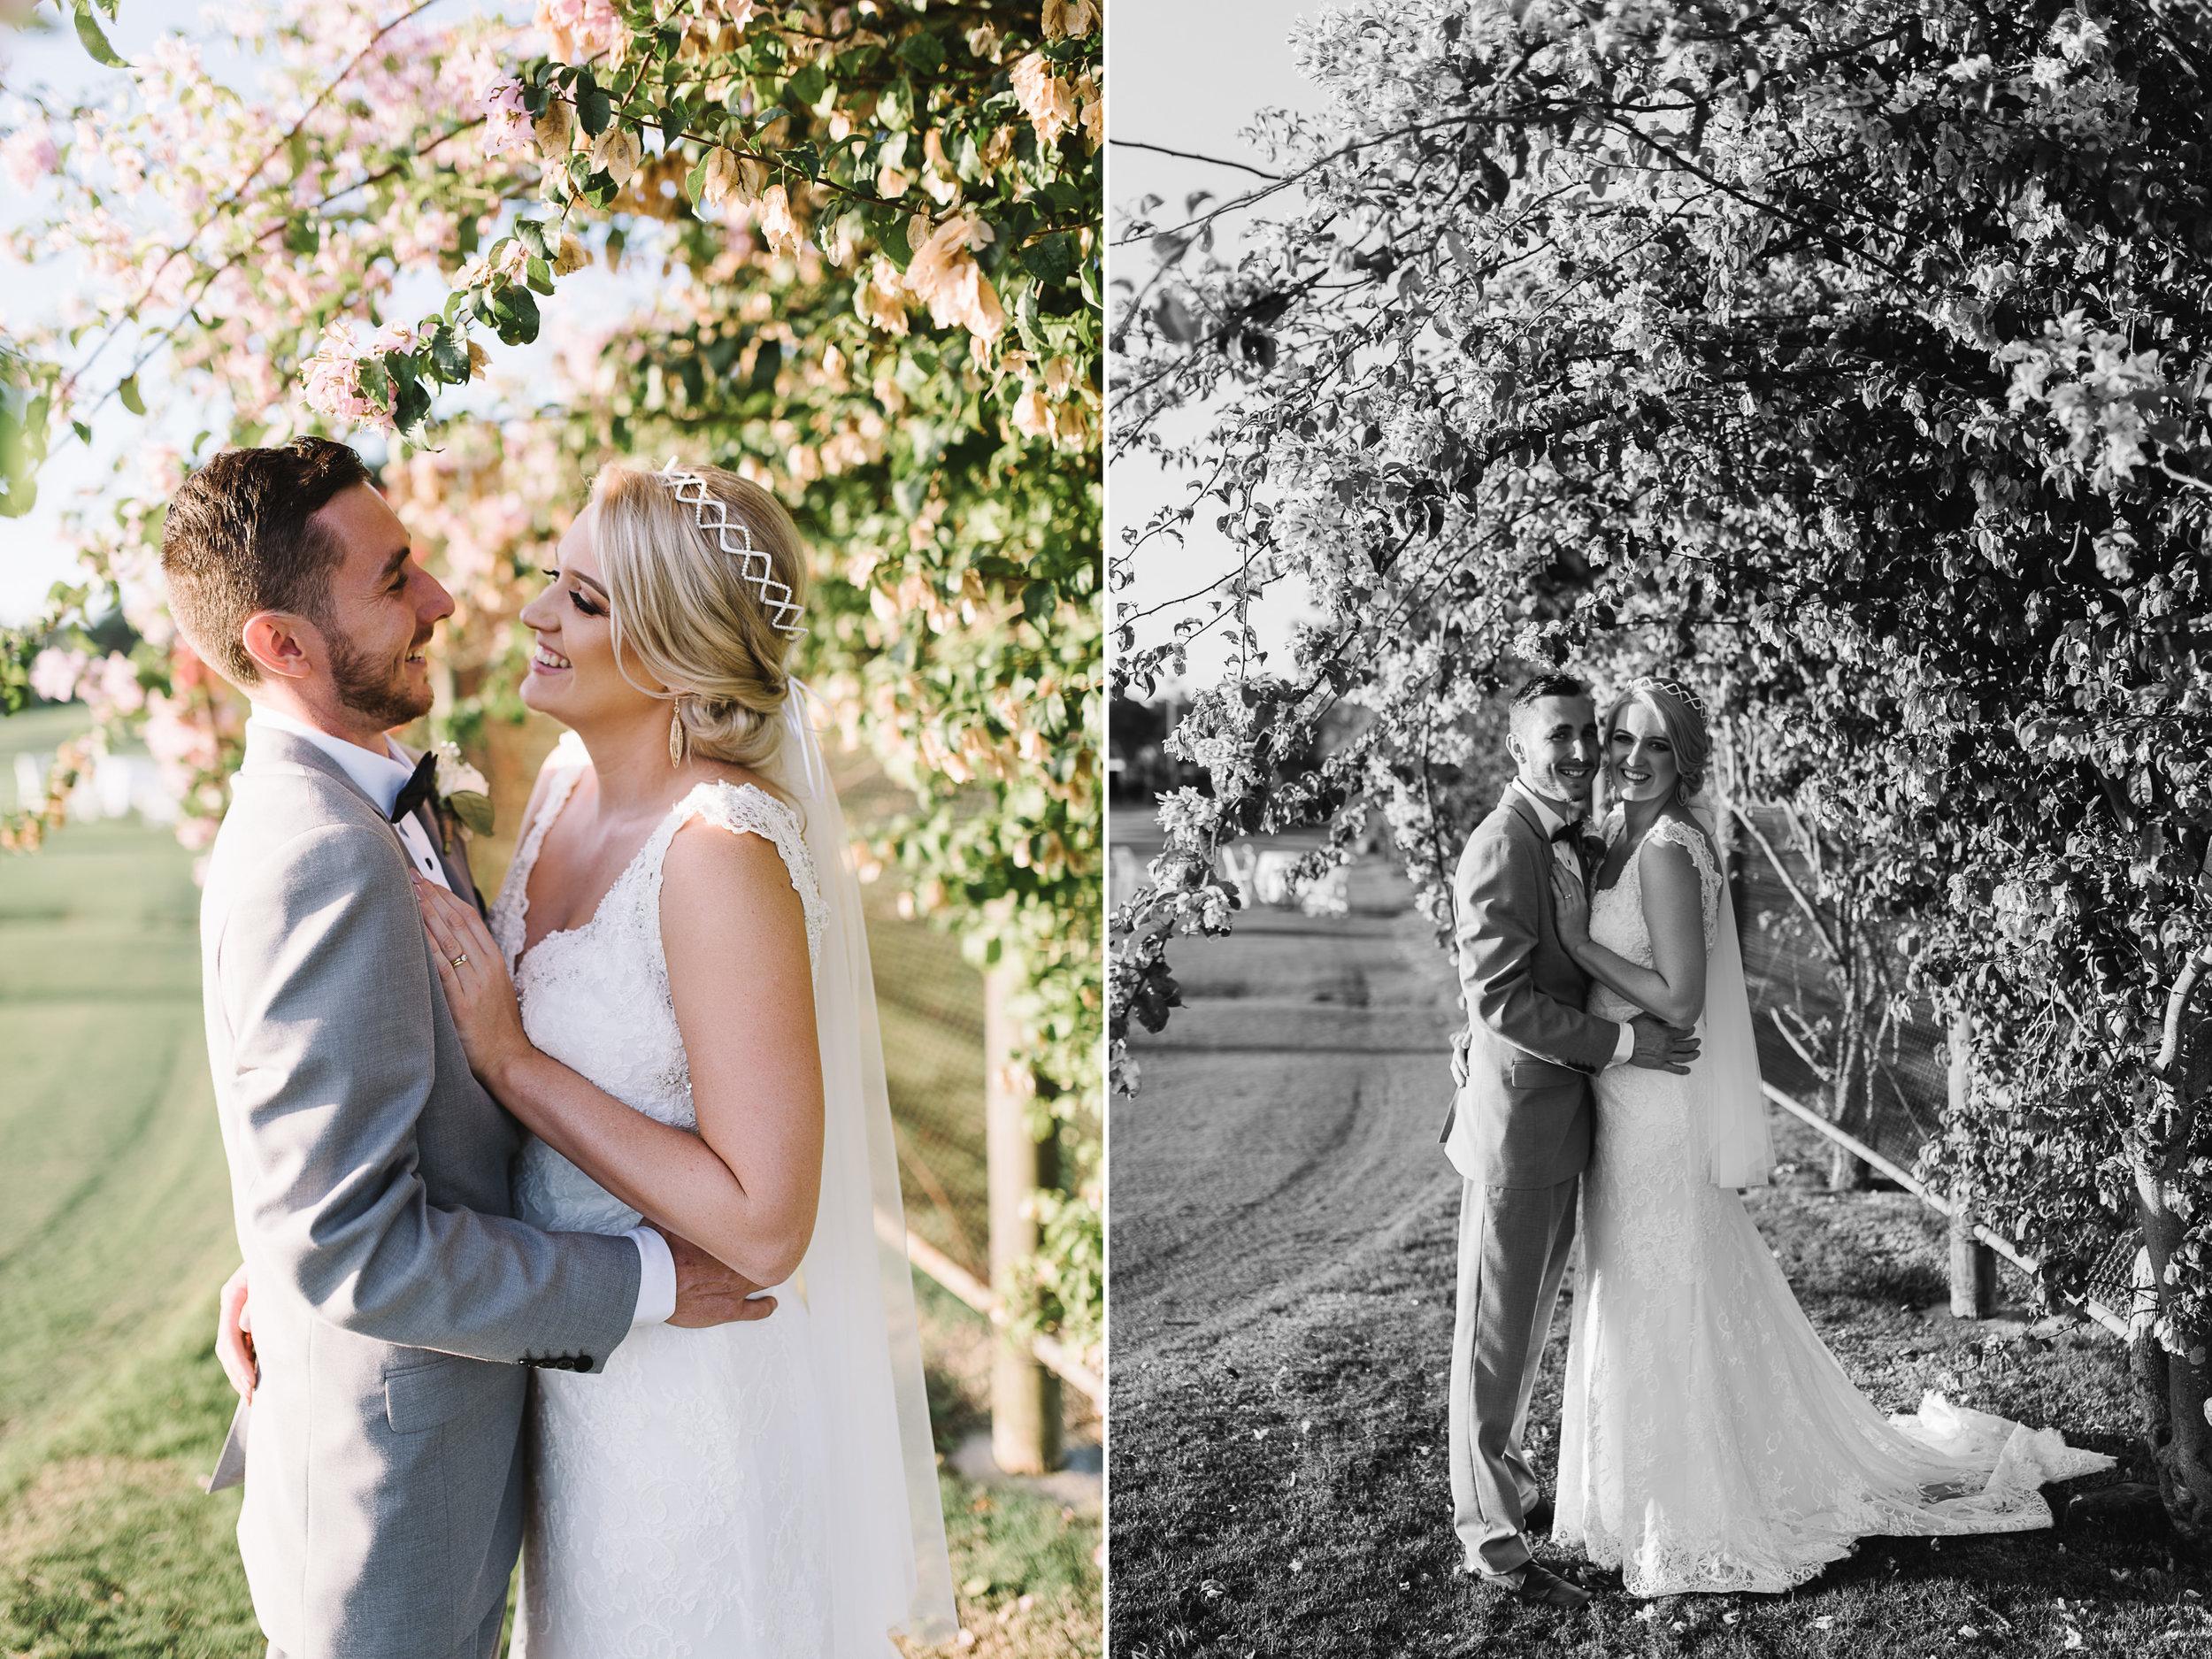 Brisbane-wedding-photography-20.jpg